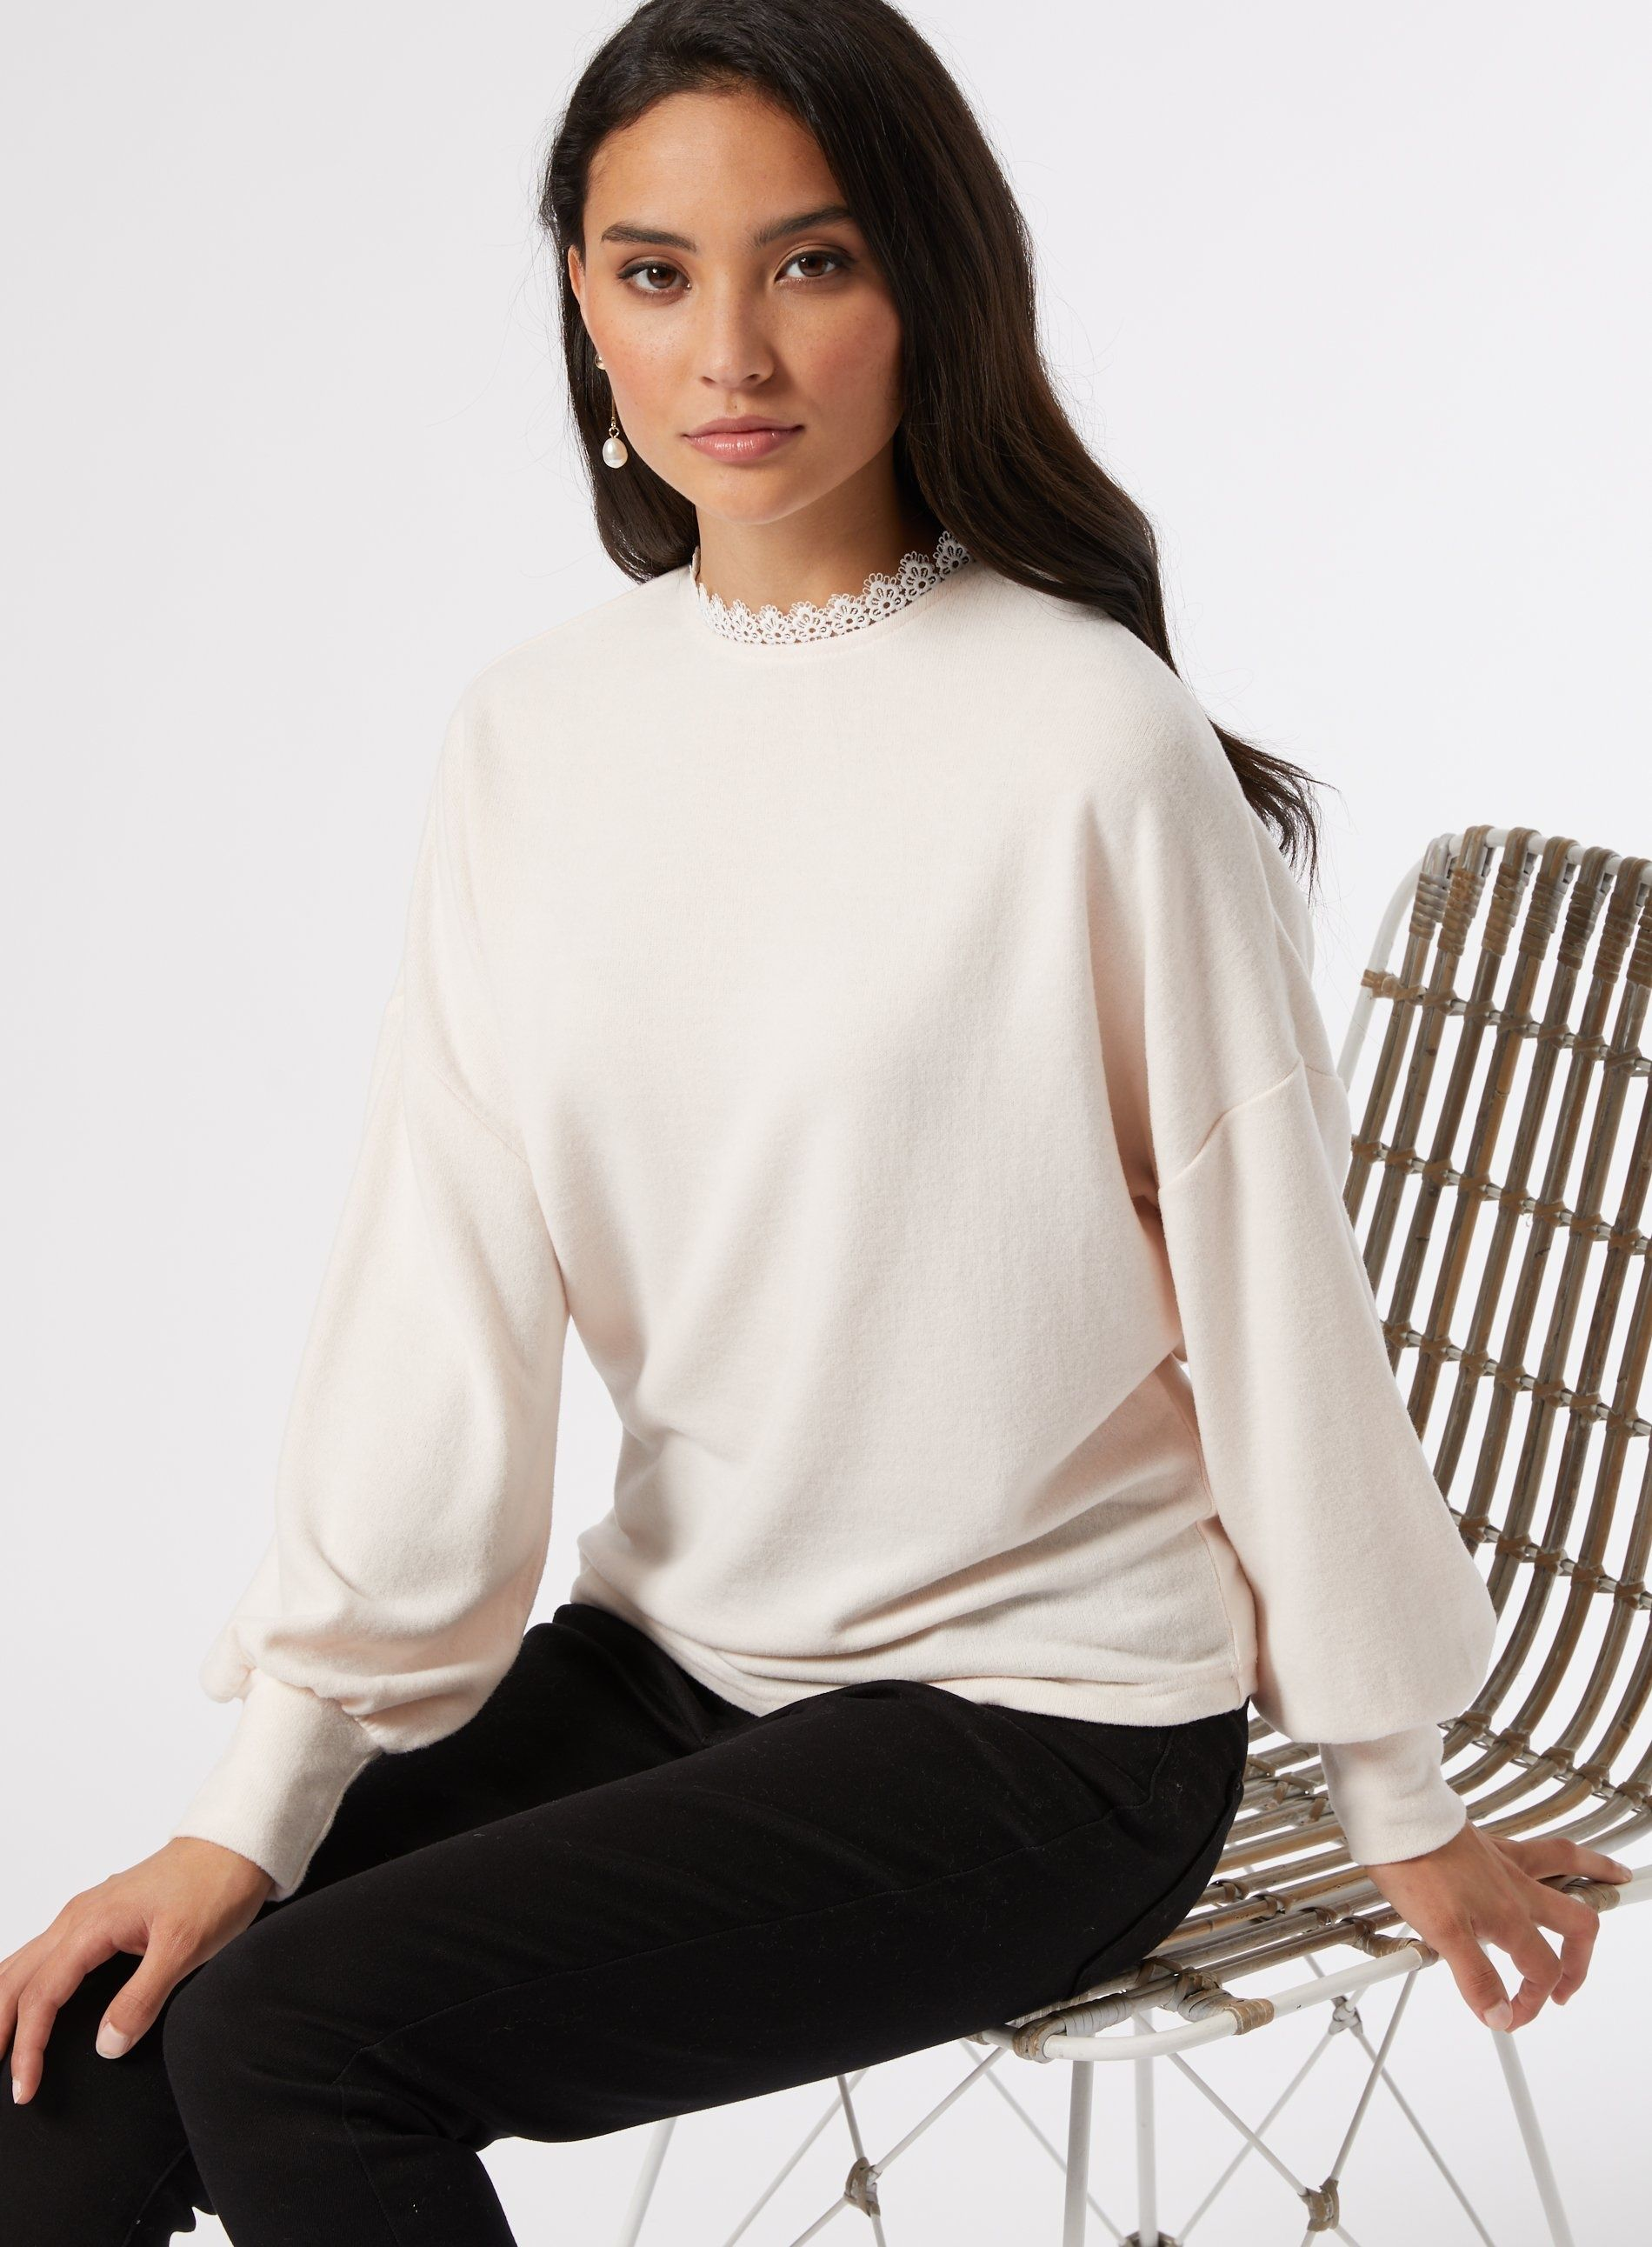 Dorothy Perkins Womens Petite Blush Lace Trim High Neck Long Sleeve Top Blouse